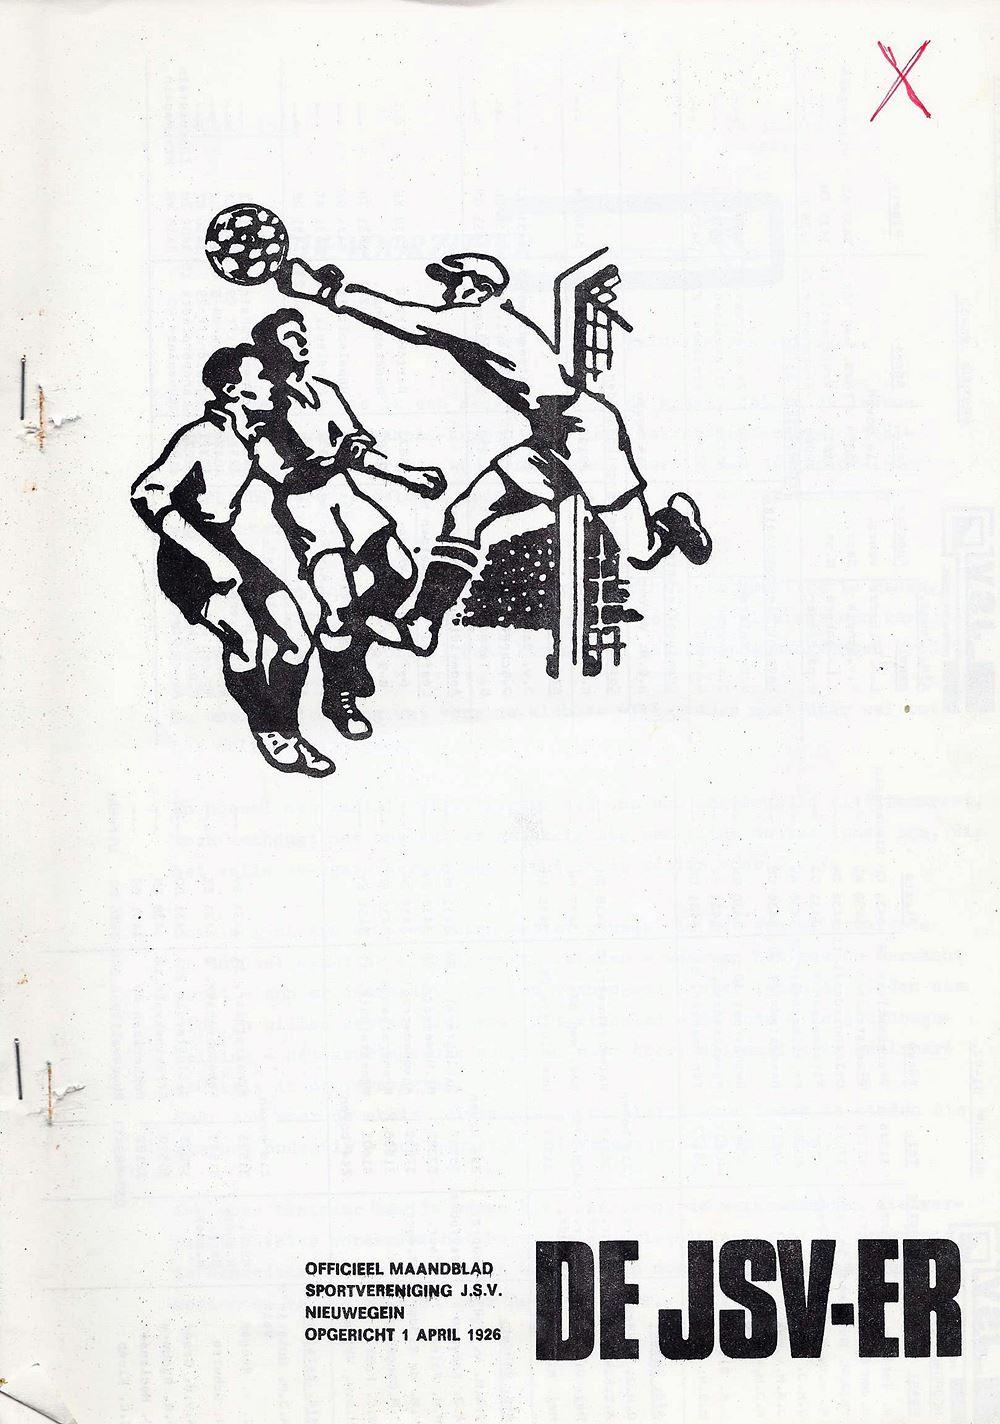 Anno 1982: niet langer countervoetbal